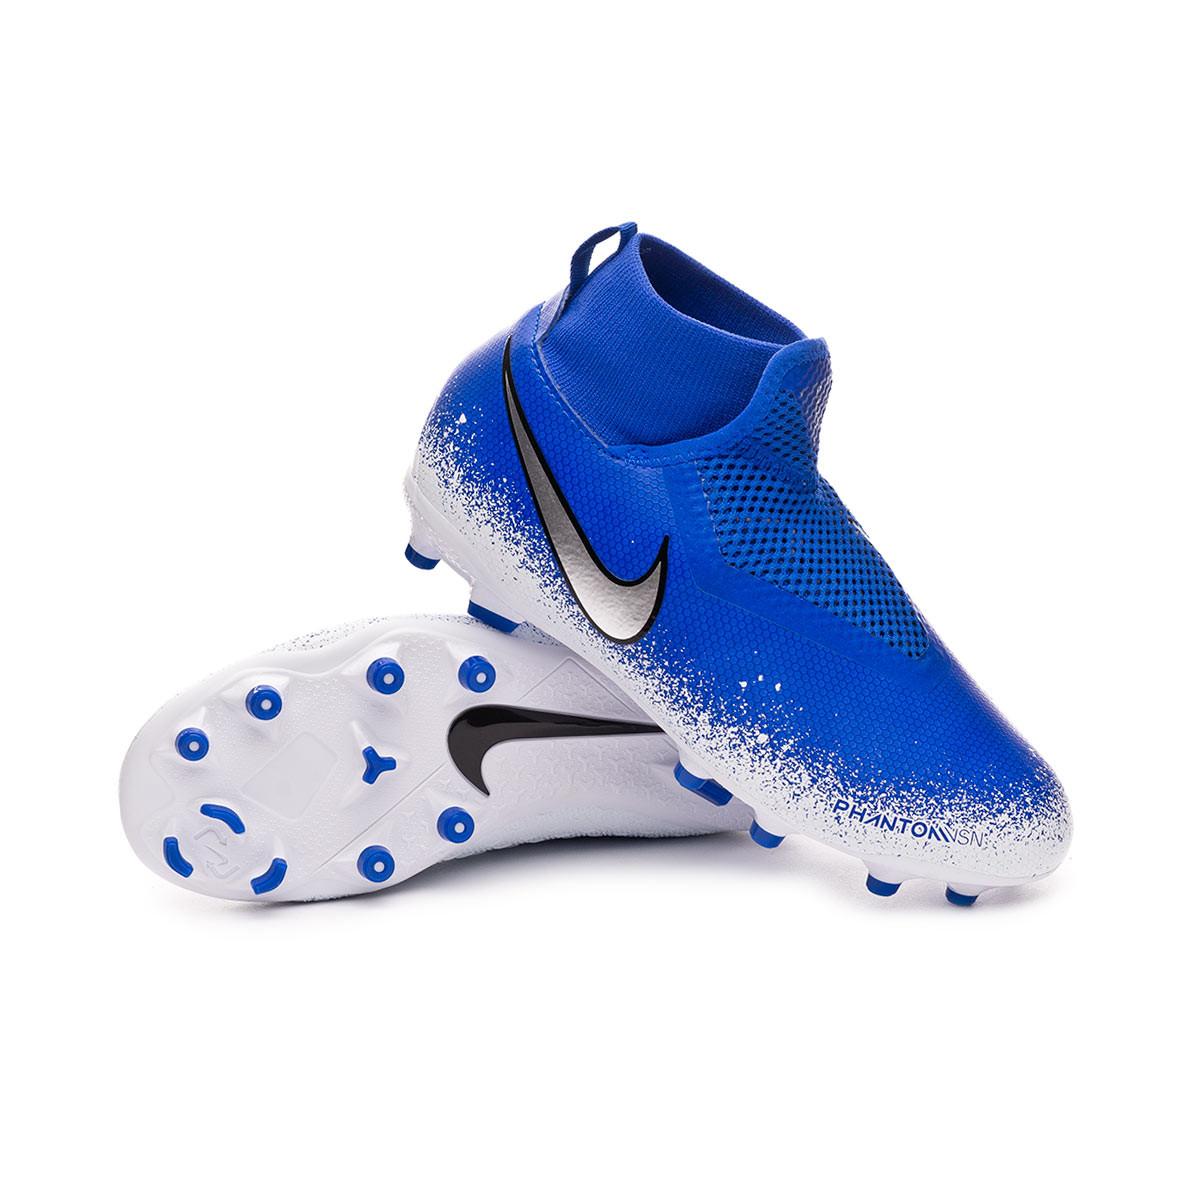 59cad60c55959 Football Boots Nike Phantom Vision Academy DF FG MG Niño Racer blue-Chrome-White  - Football store Fútbol Emotion